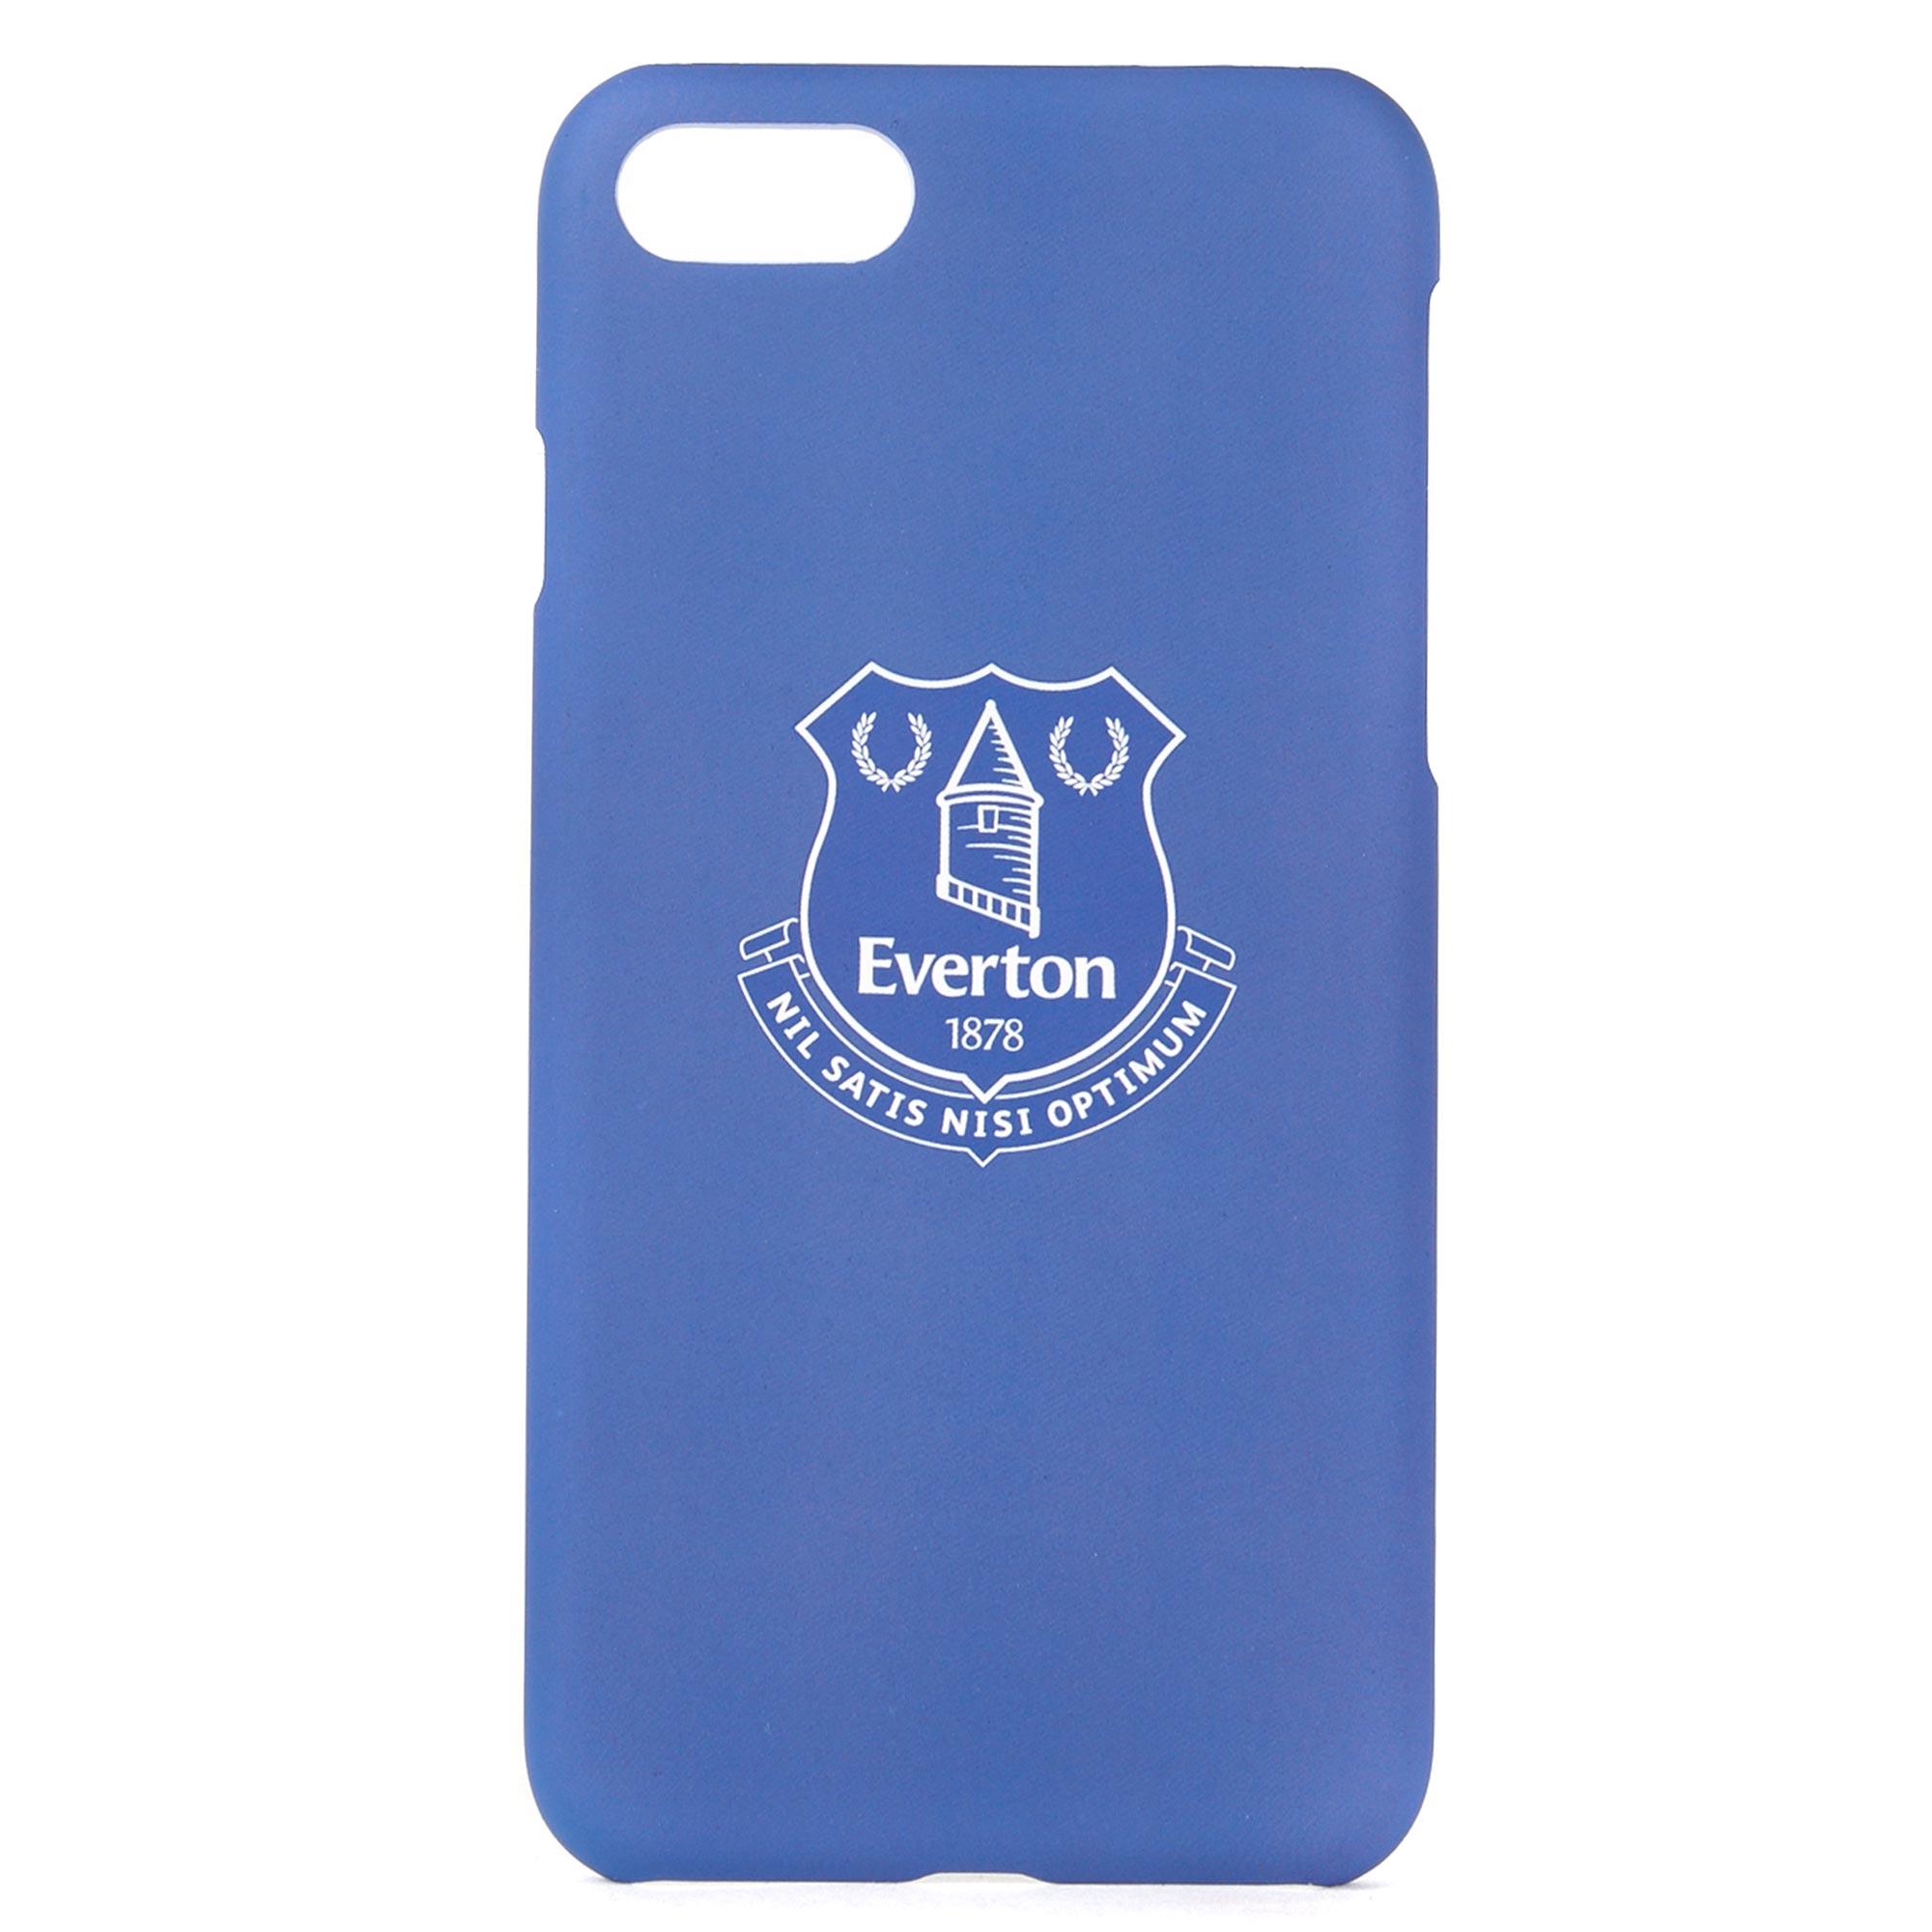 Everton iPhone 7 - Hard Case